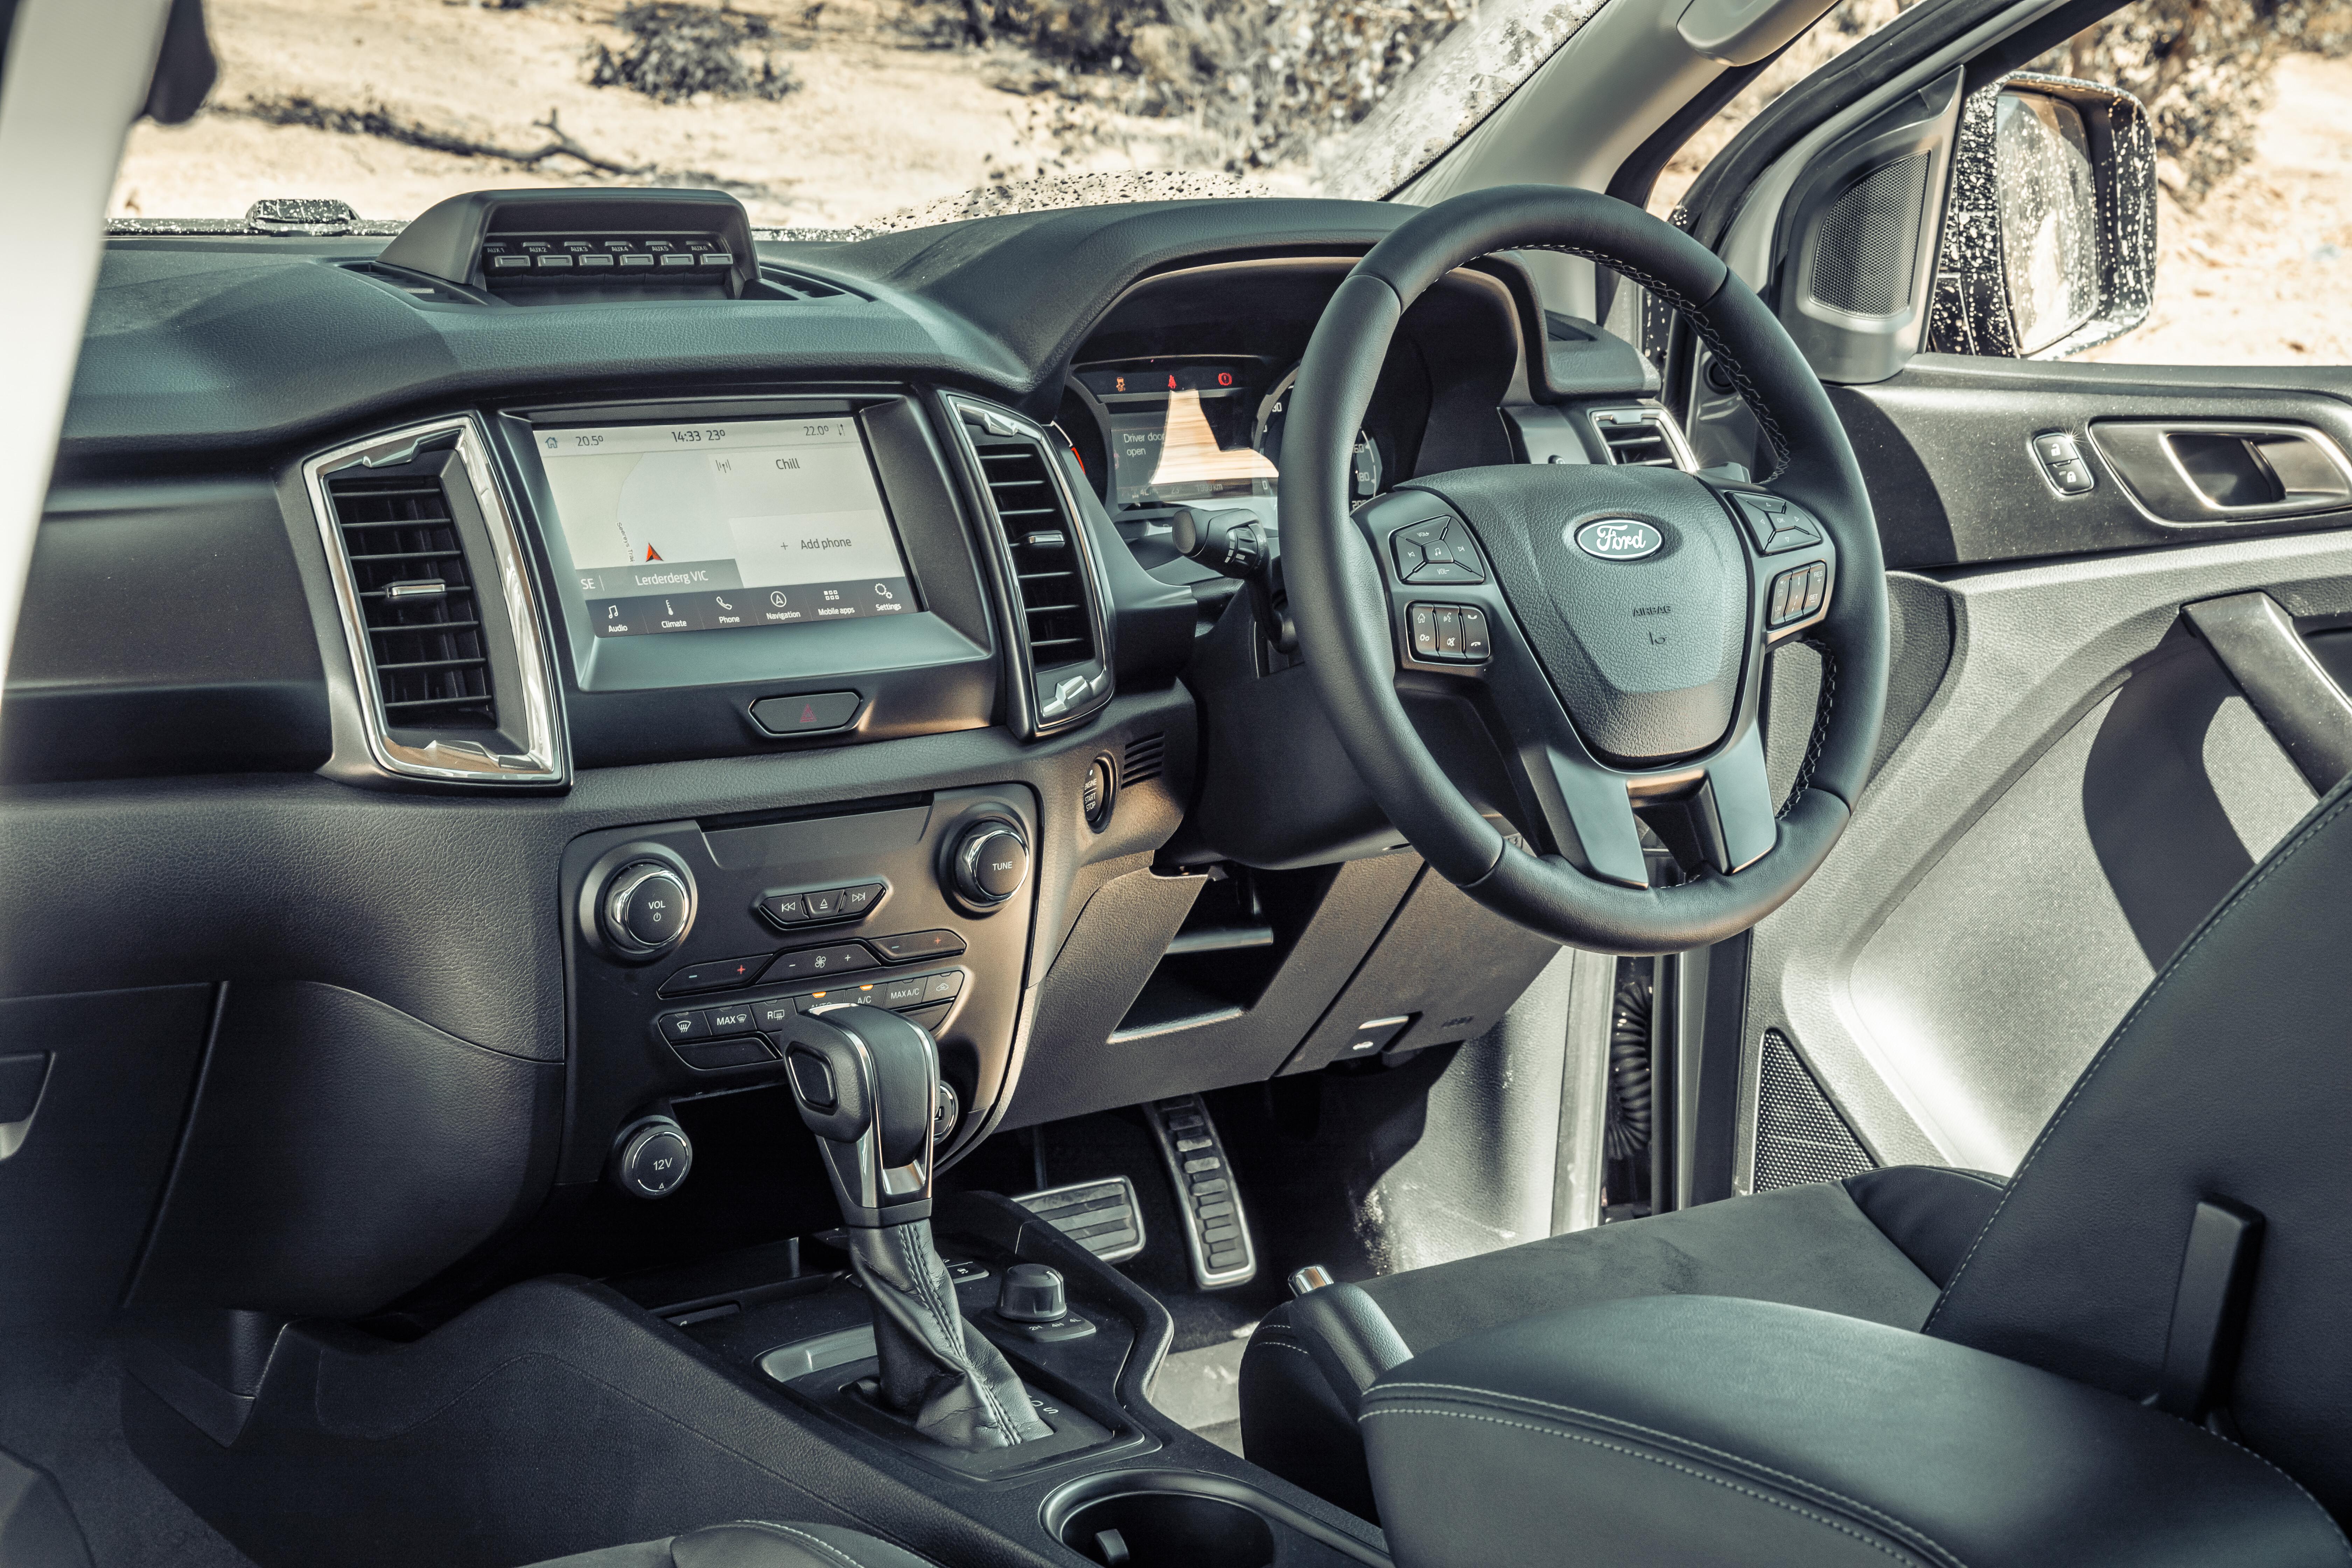 4 X 4 Australia Comparisons 2021 May 21 Ford Ranger FX 4 MAX 1